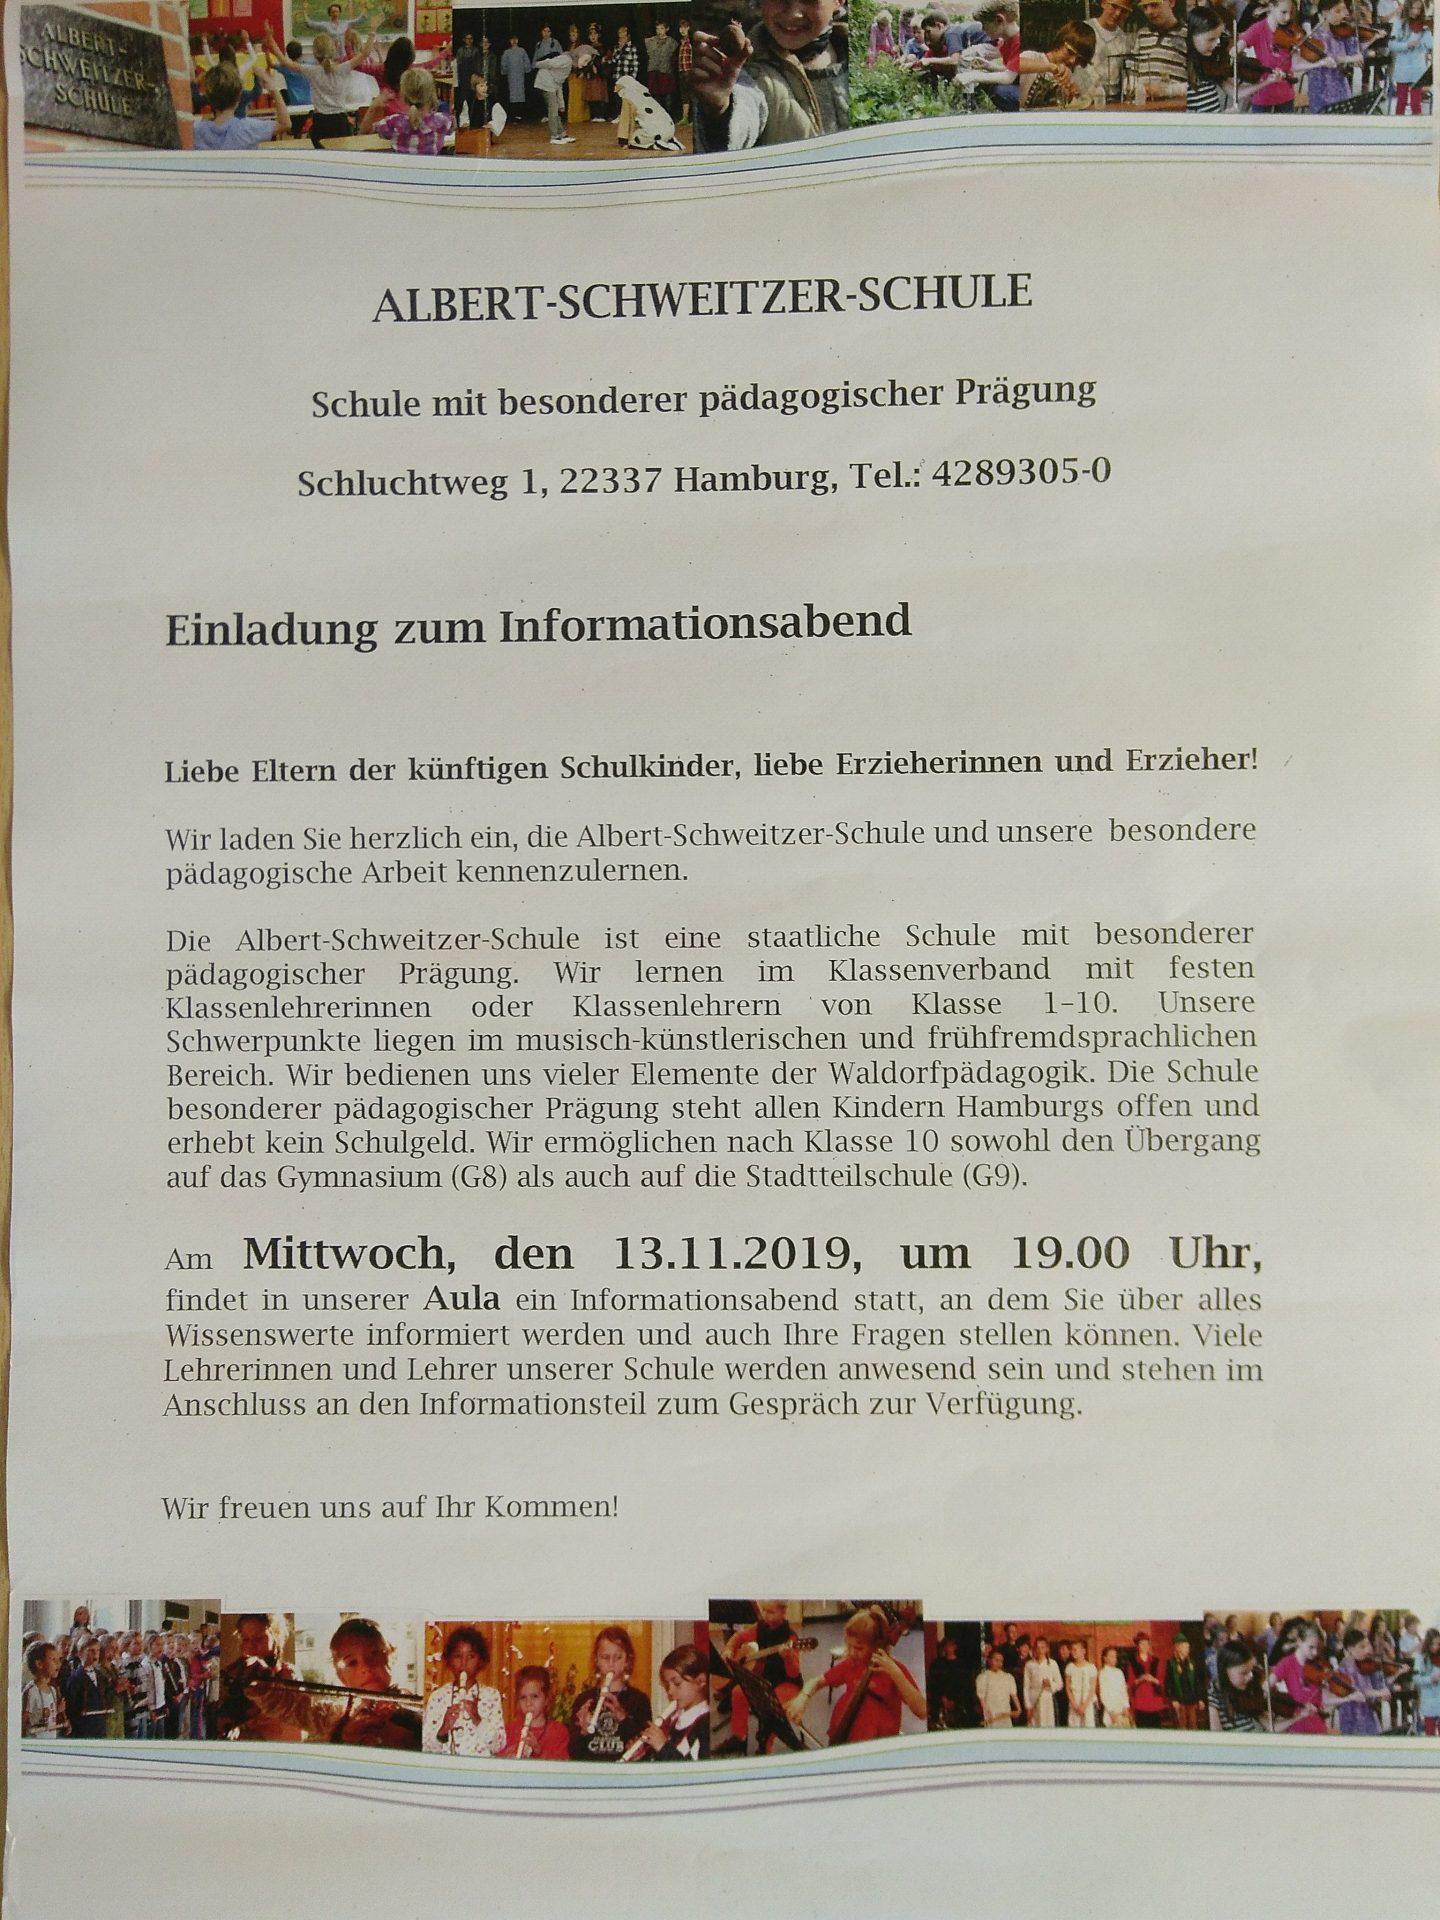 13.11. Informationsabend (Schule mit bes. päd. Prägung)